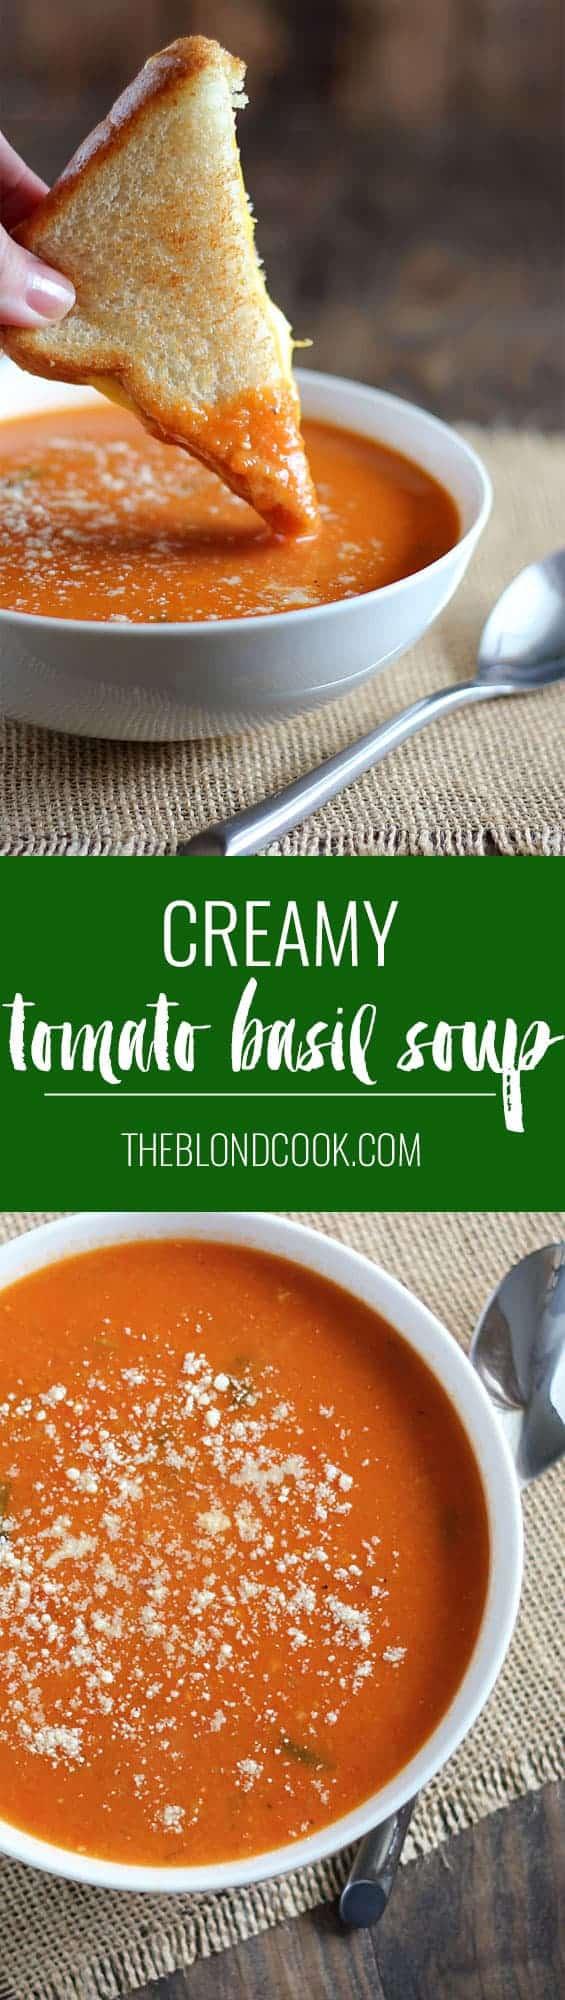 Creamy Tomato Basil Soup | theblondcook.com